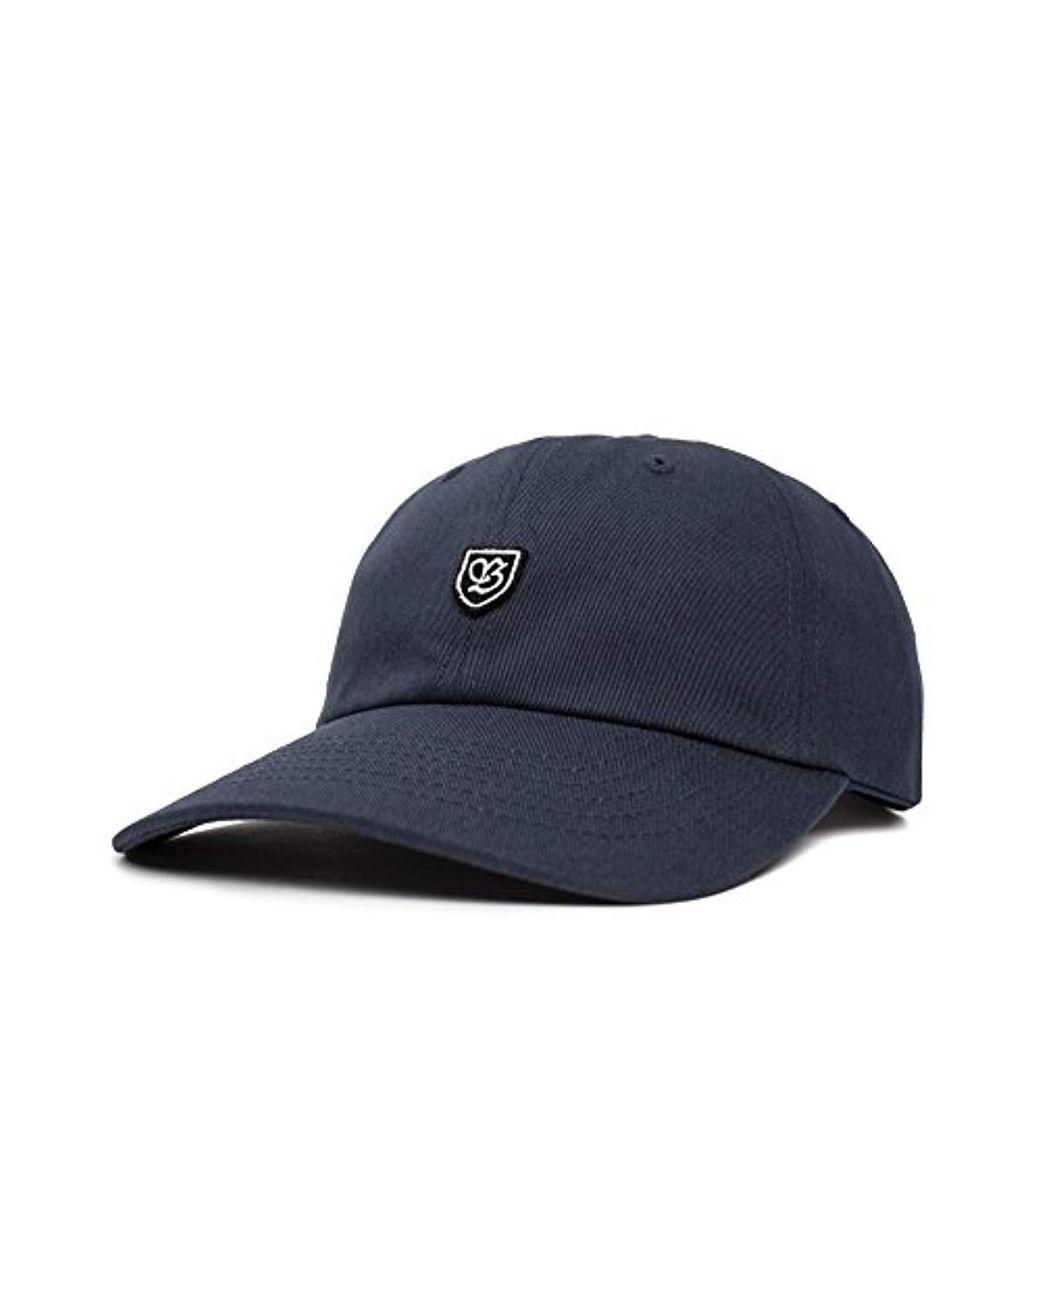 5f9f47cc5c80f Brixton B-shield Ii Low Profile Unstructured Adjustable Hat in Blue ...